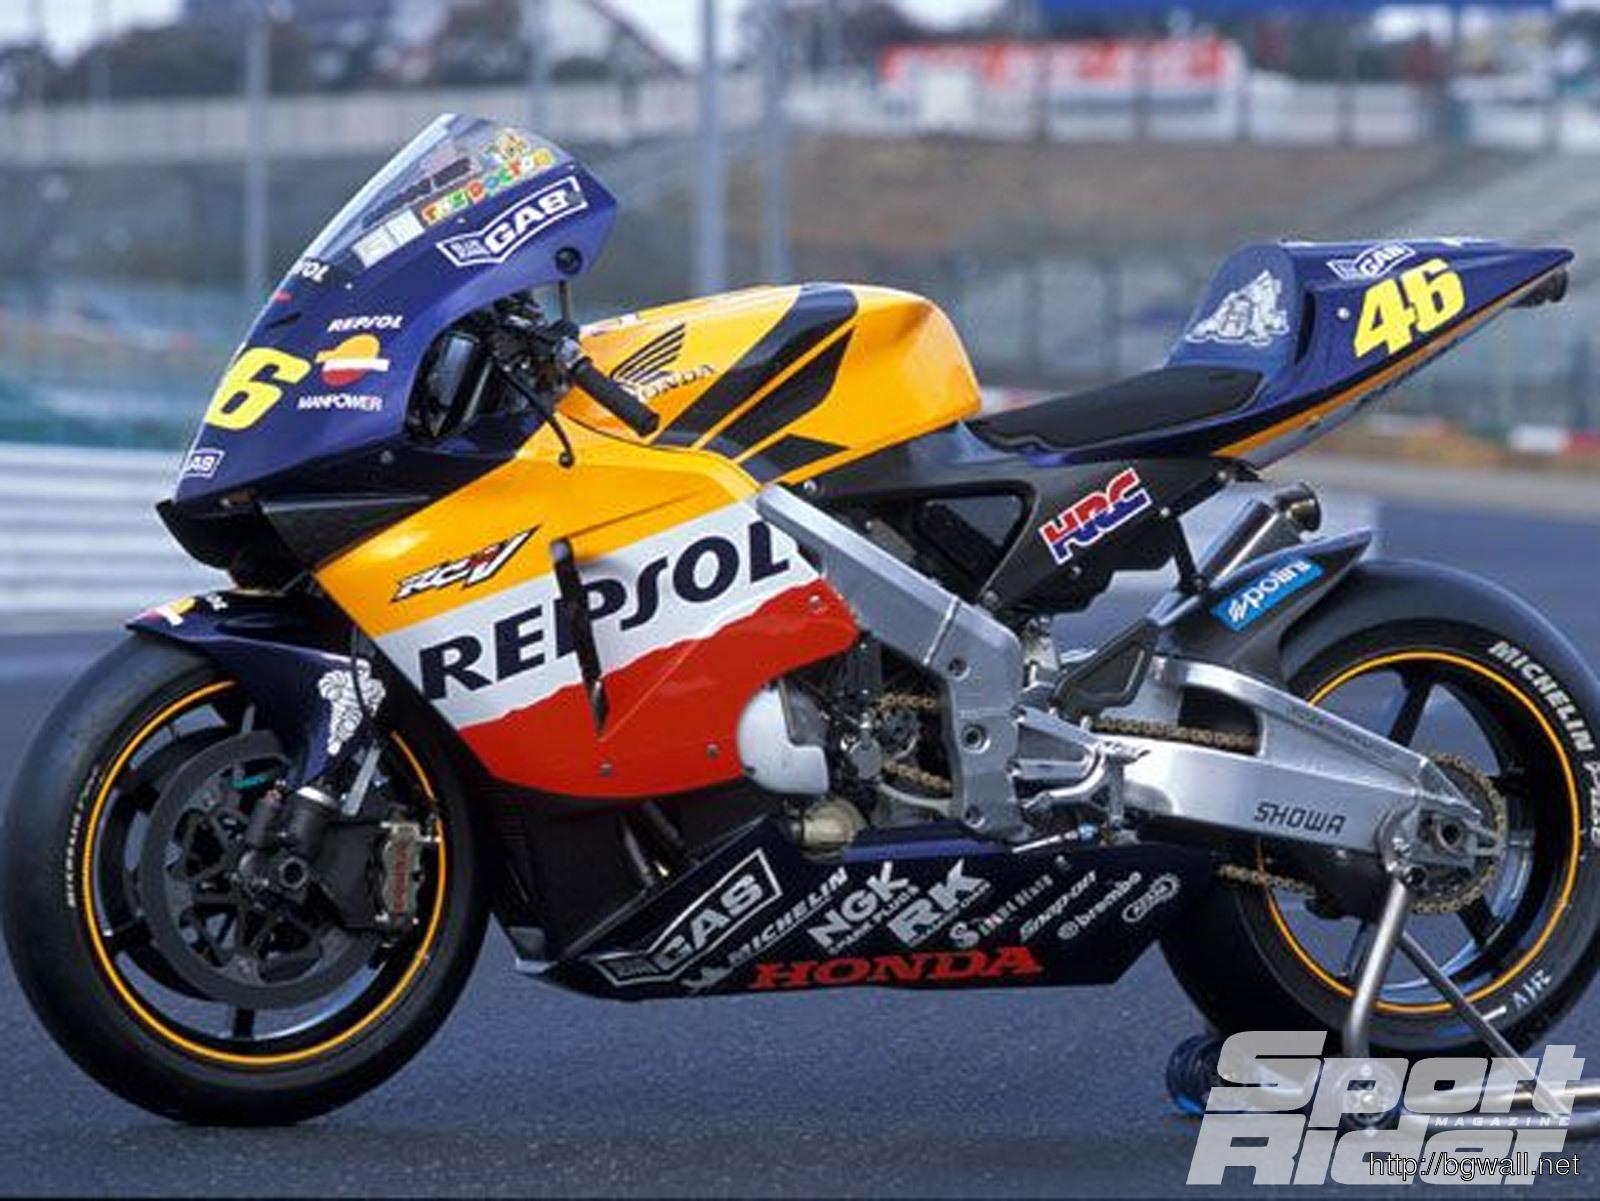 2003 Honda Rc211v 2003 Honda Rc211v Rip Doriano Romboni Tragic Full Size